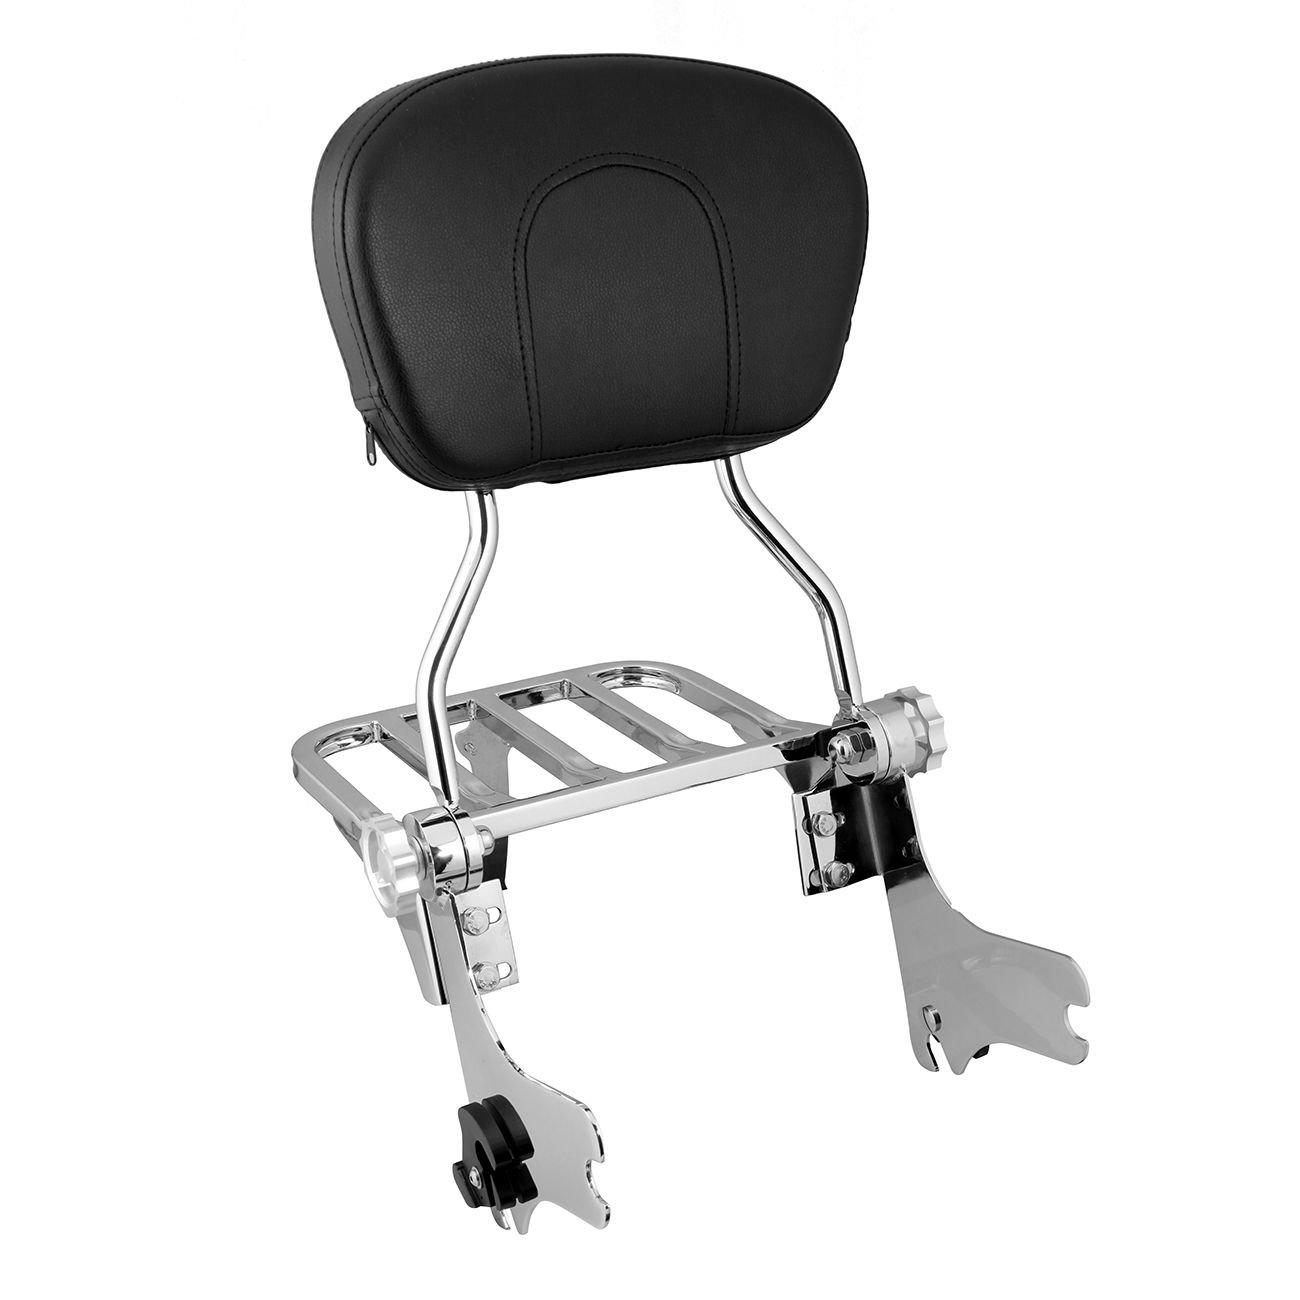 Iglobalbuy Chrome Adjustable Detachable Backrest Sissy Bar With Luggage Rack Pad For Harley Road King Electra Glide Street Glide